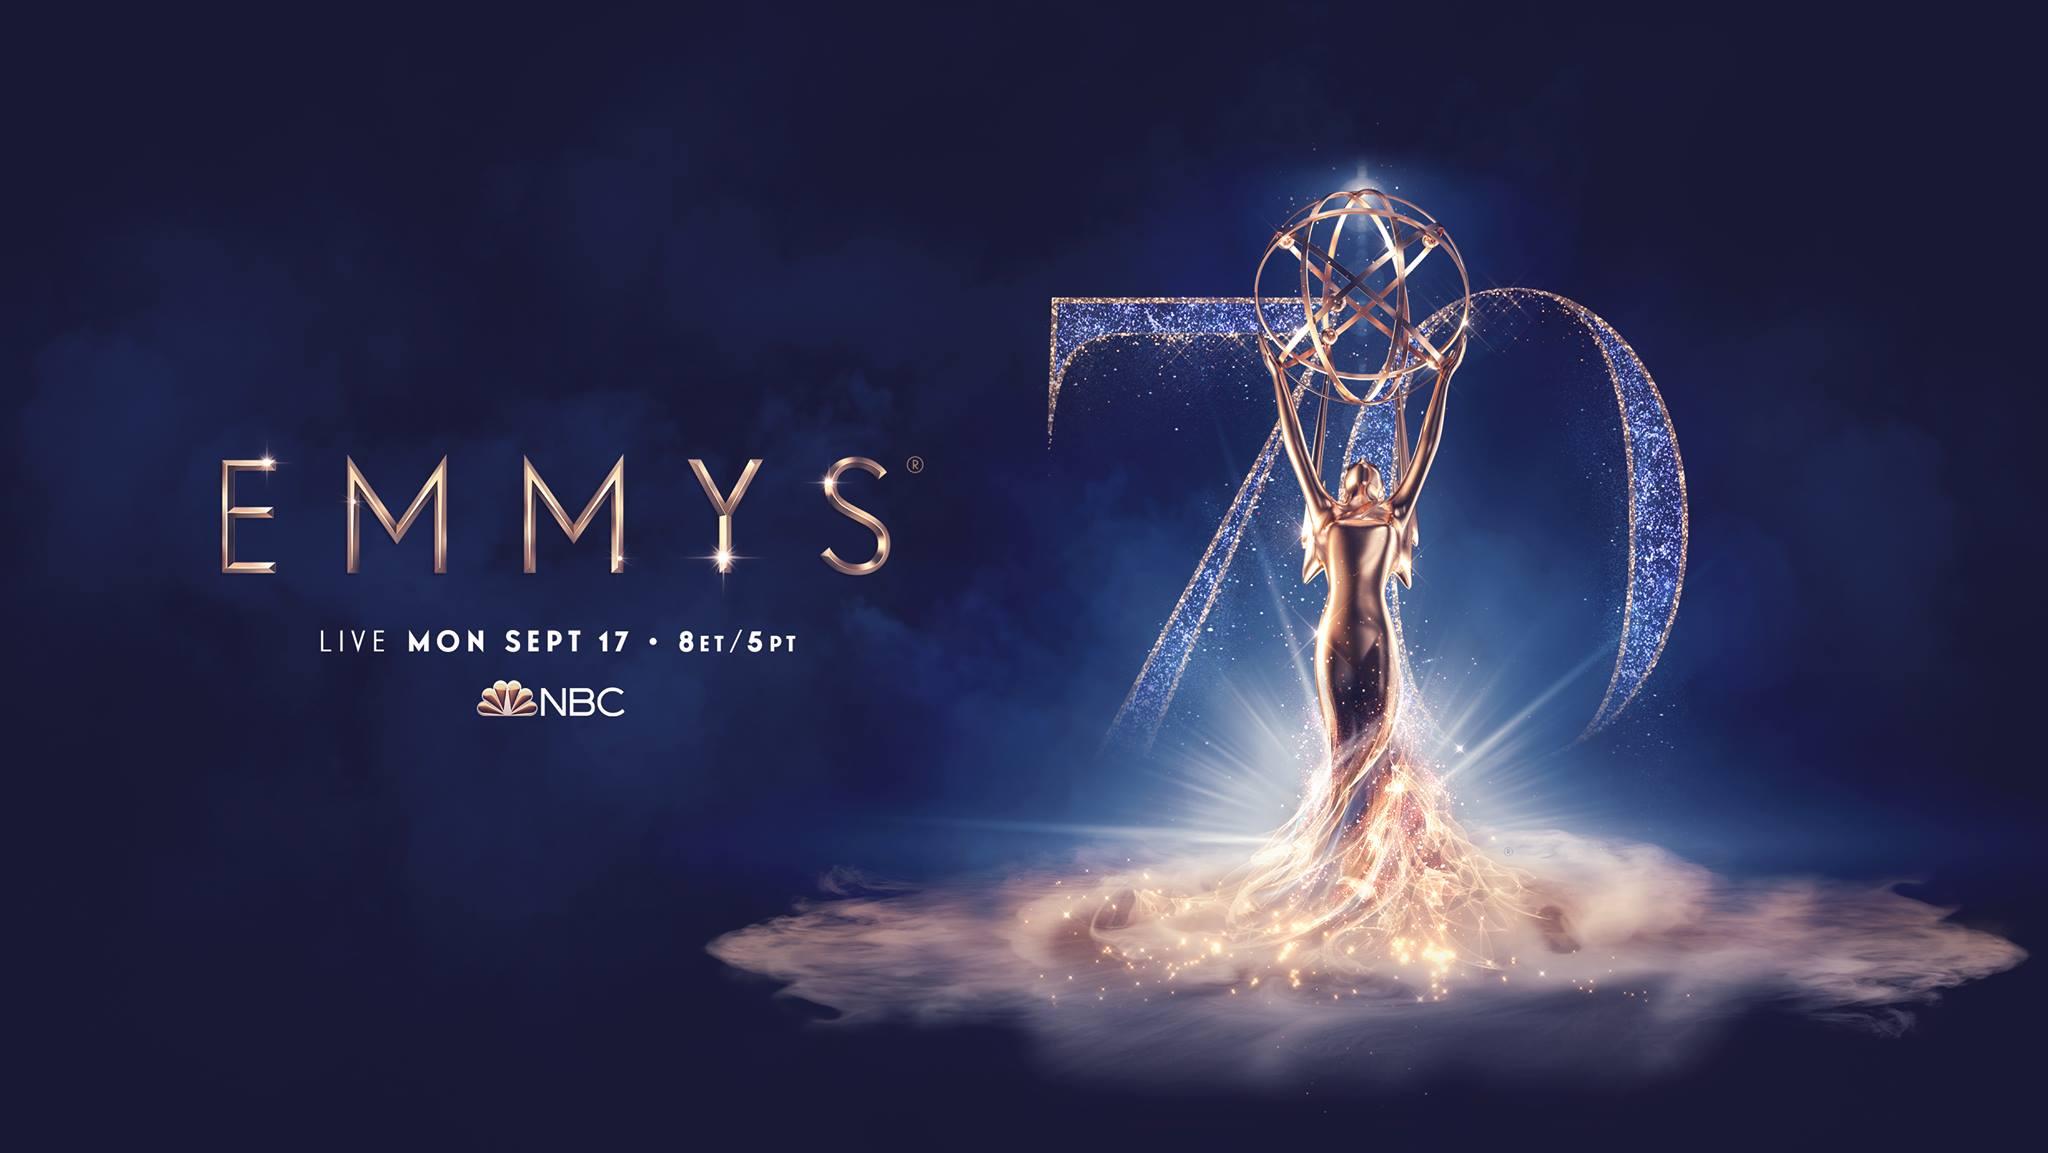 emmys 2018 winners awards